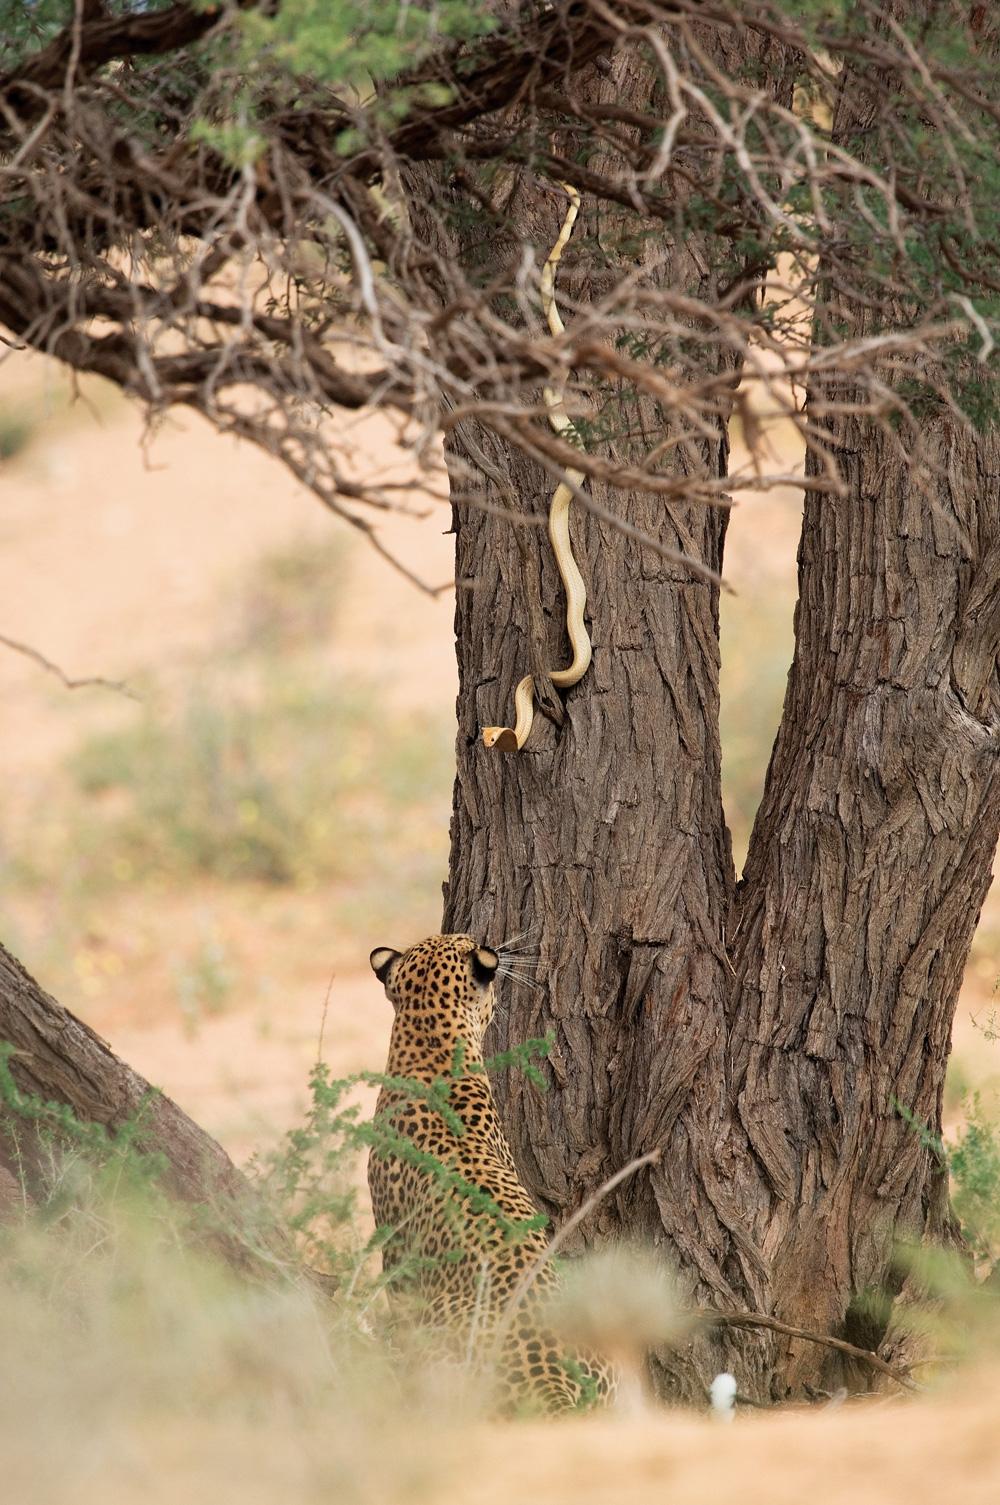 Leopard-and-snake-hannes-lochner